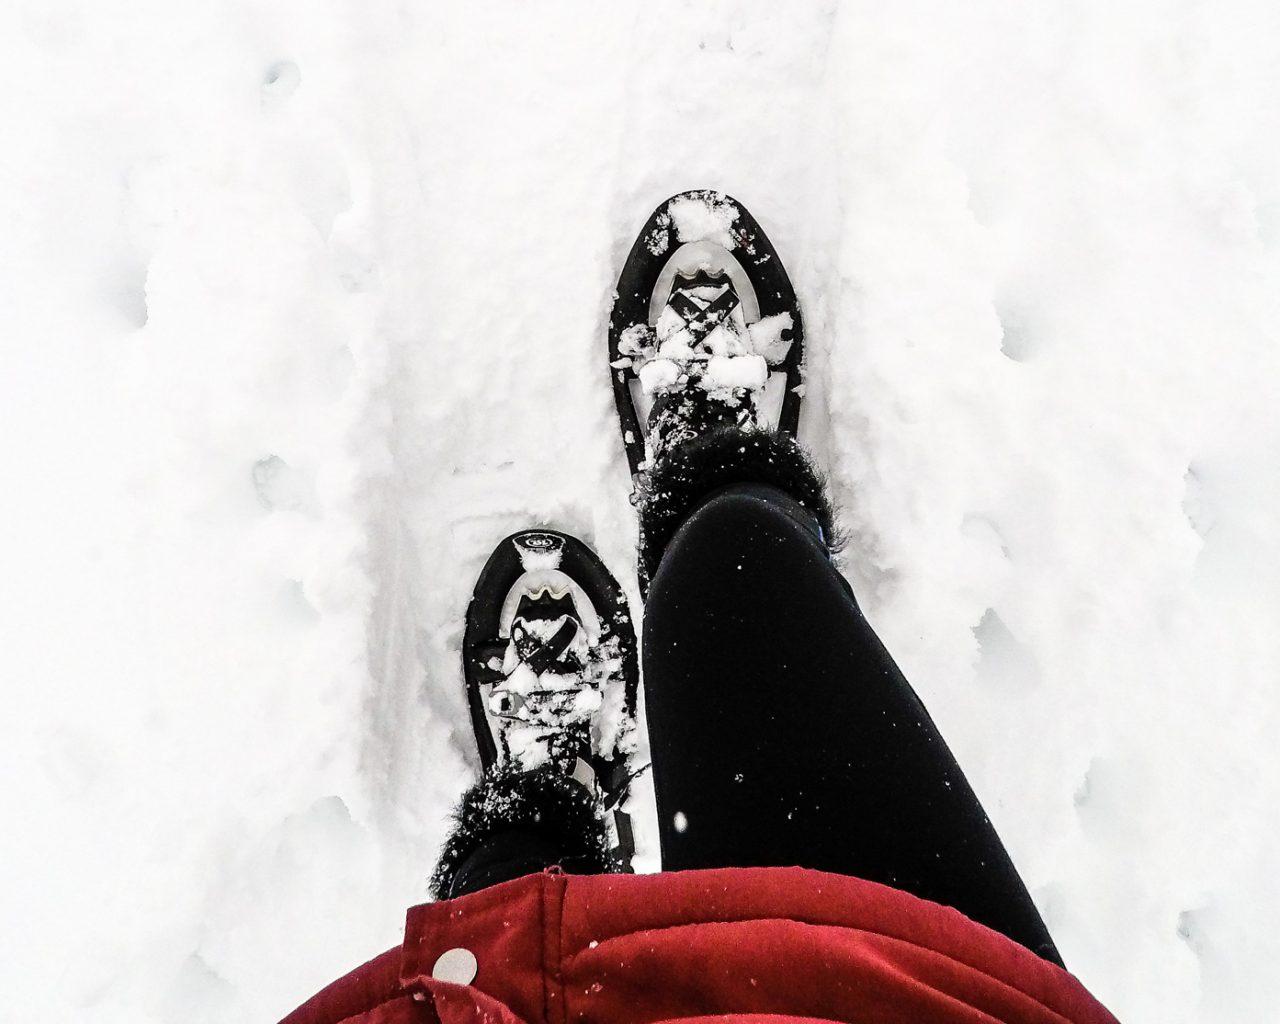 Sneeuwschoenwandelen-wandelsokken